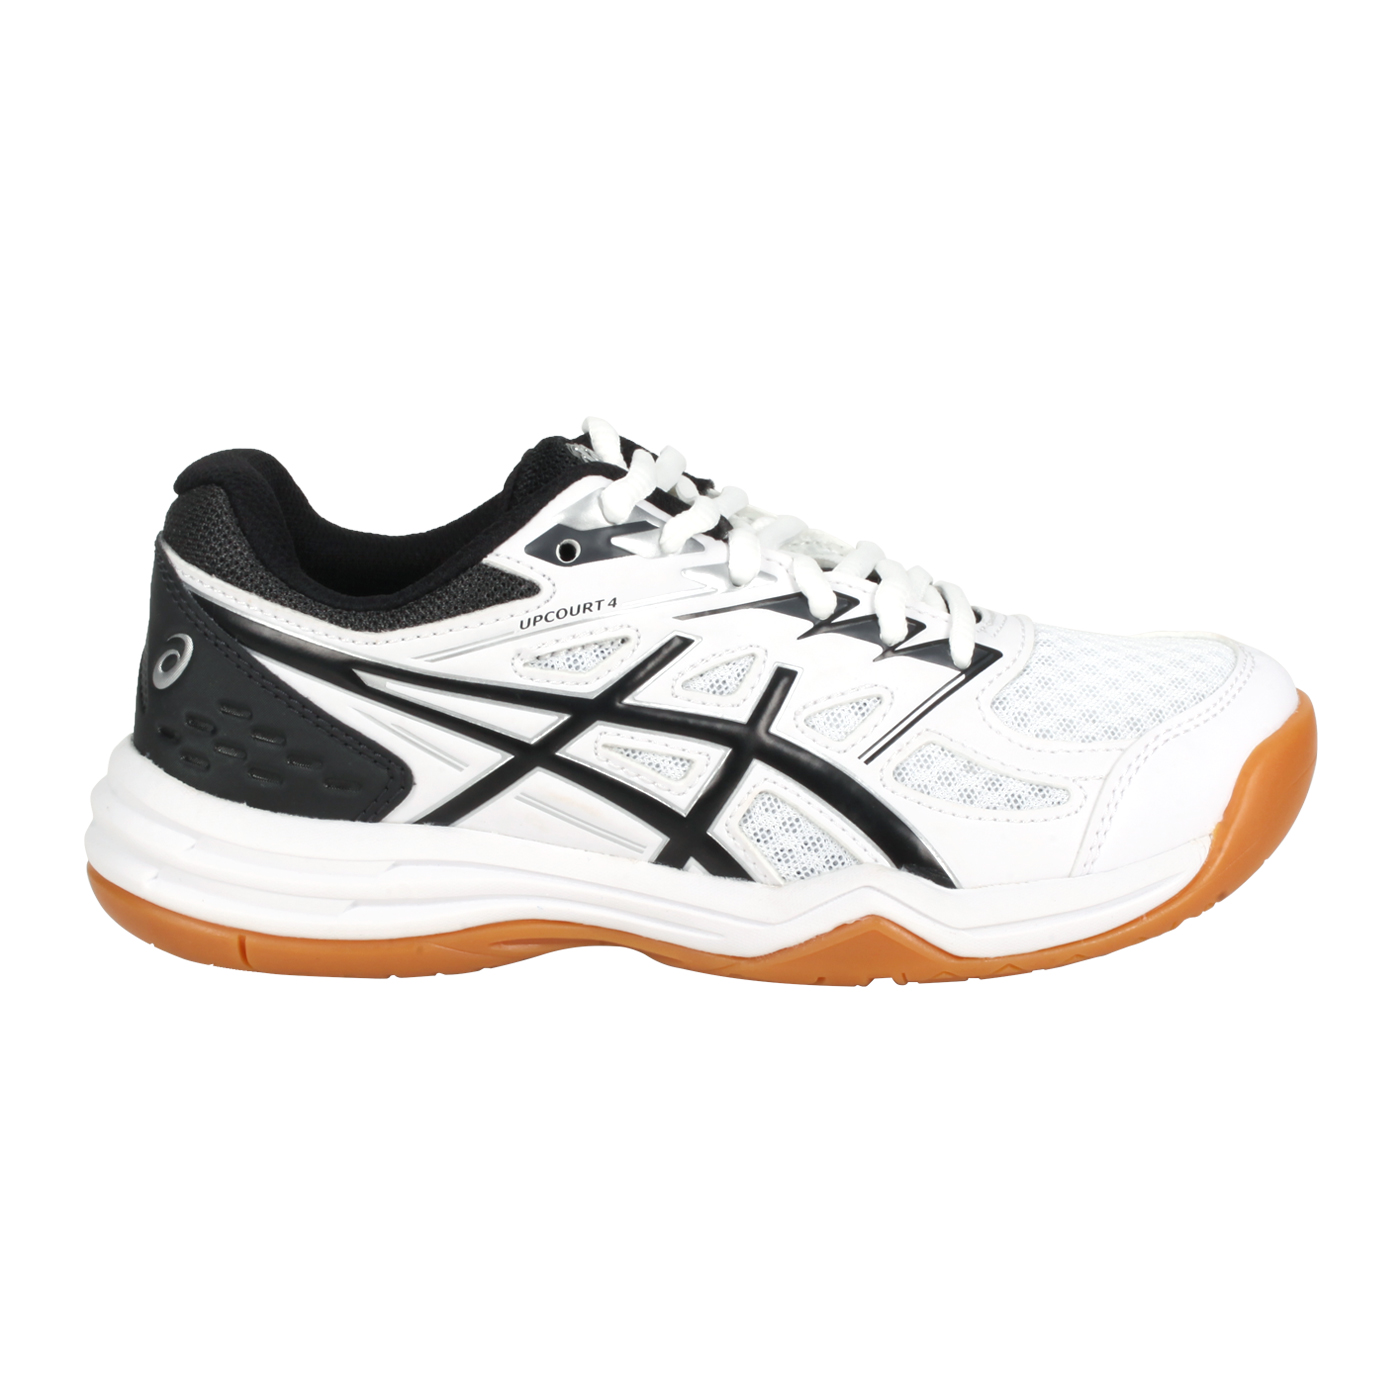 ASICS 大童排羽球鞋  @UPCOURT 4 GS@1074A027-100 - 白黑